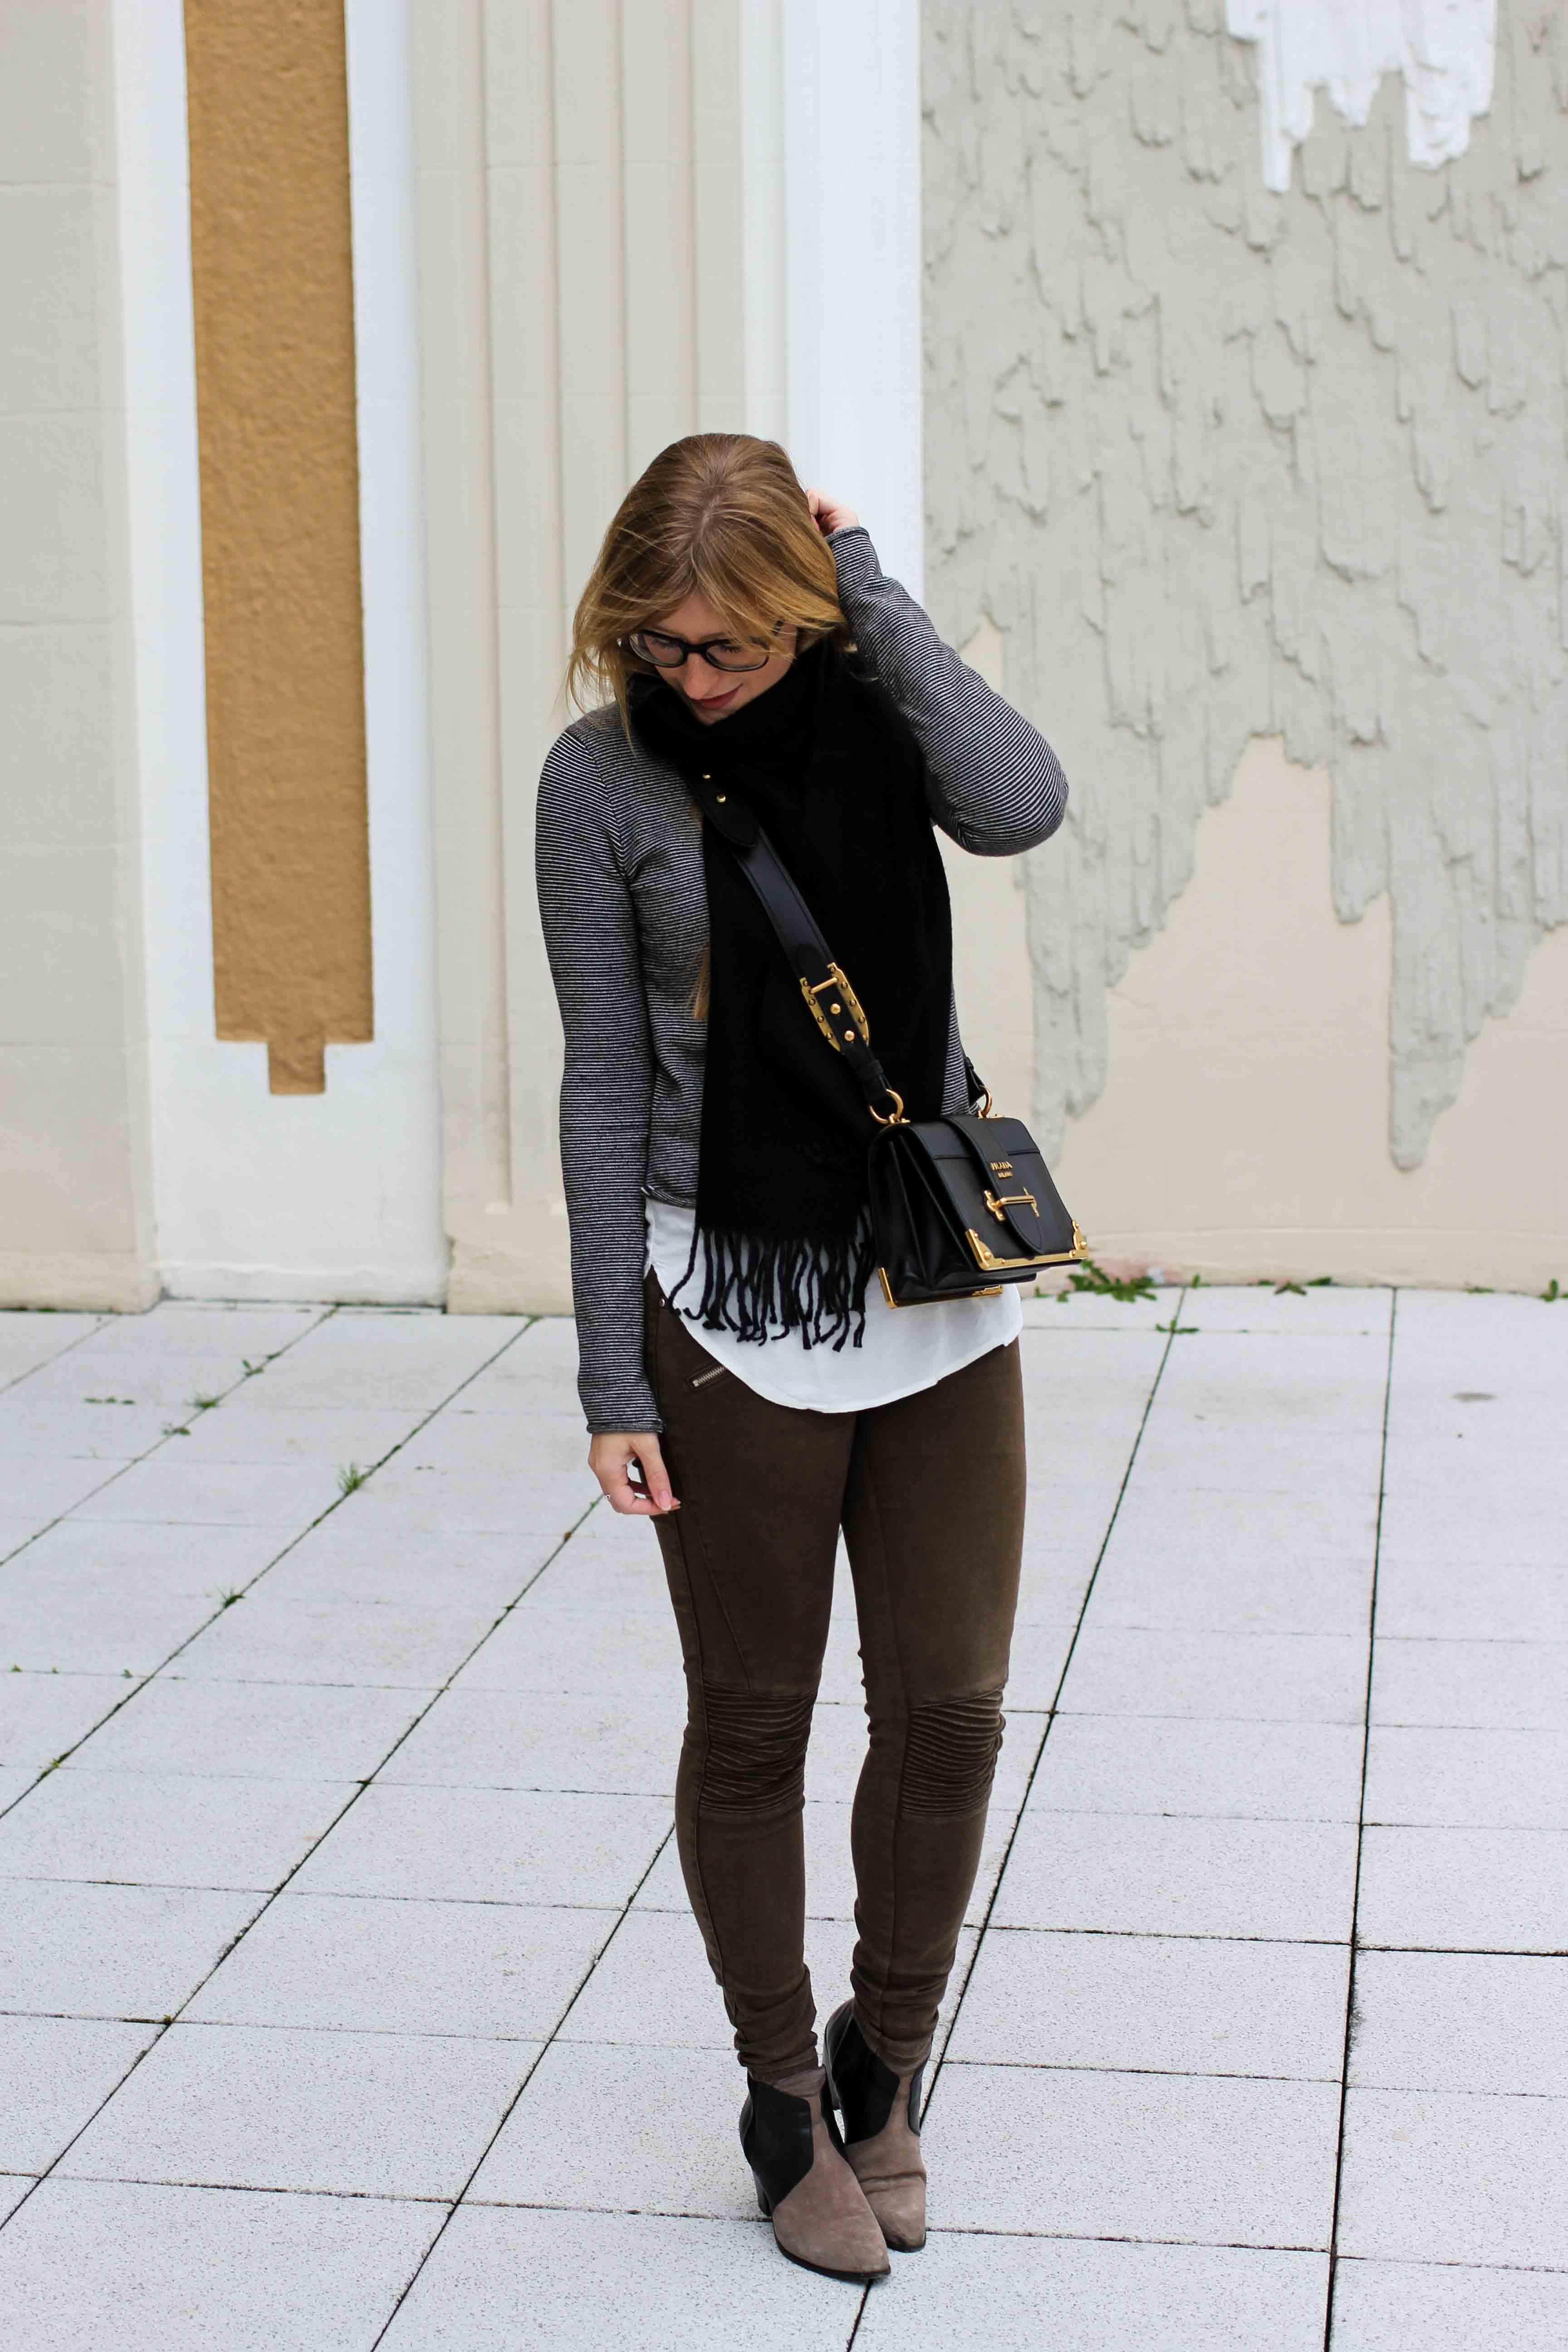 Casual Jeans Look Zara Pullover Schal Winteroutfit Prada Tasche schwarz Modeblogger 5